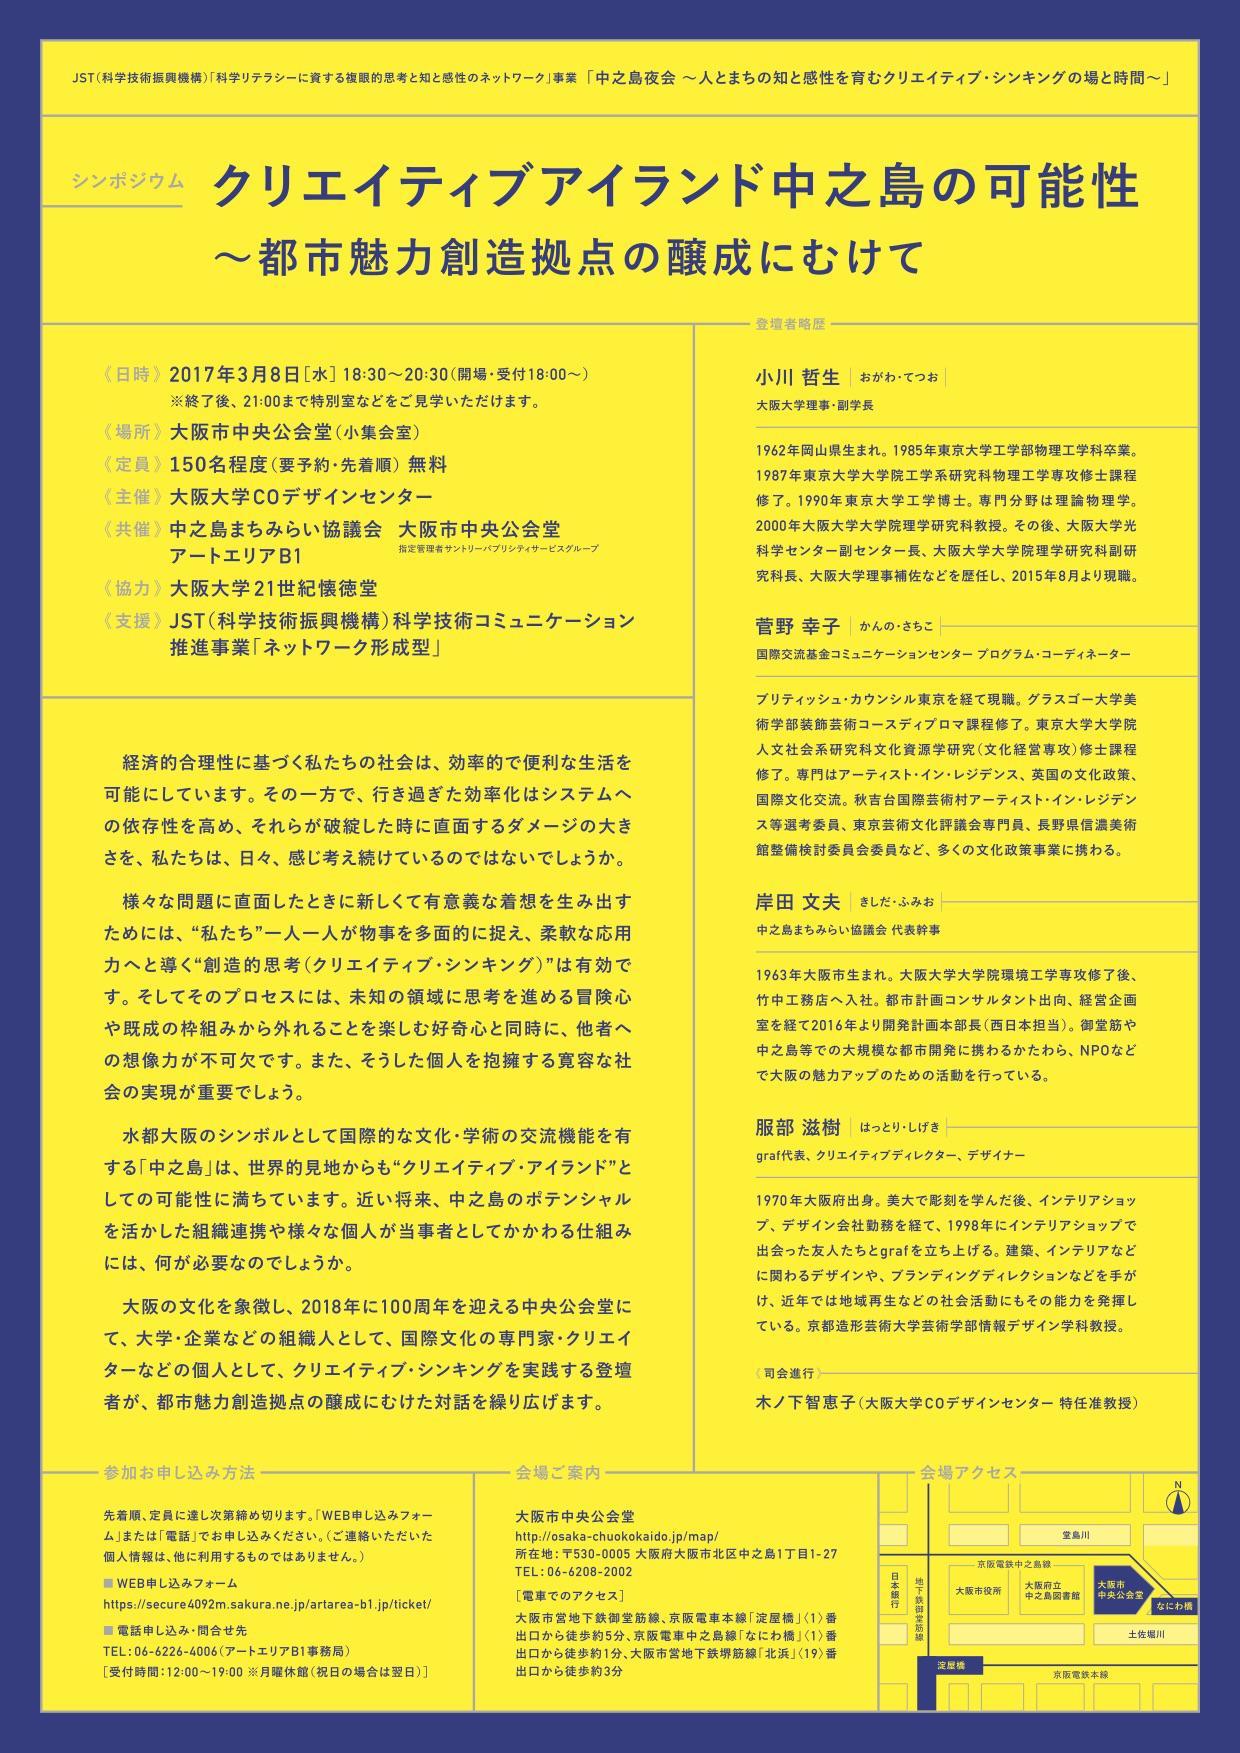 0207_nakanoshima-symposium 3.jpg